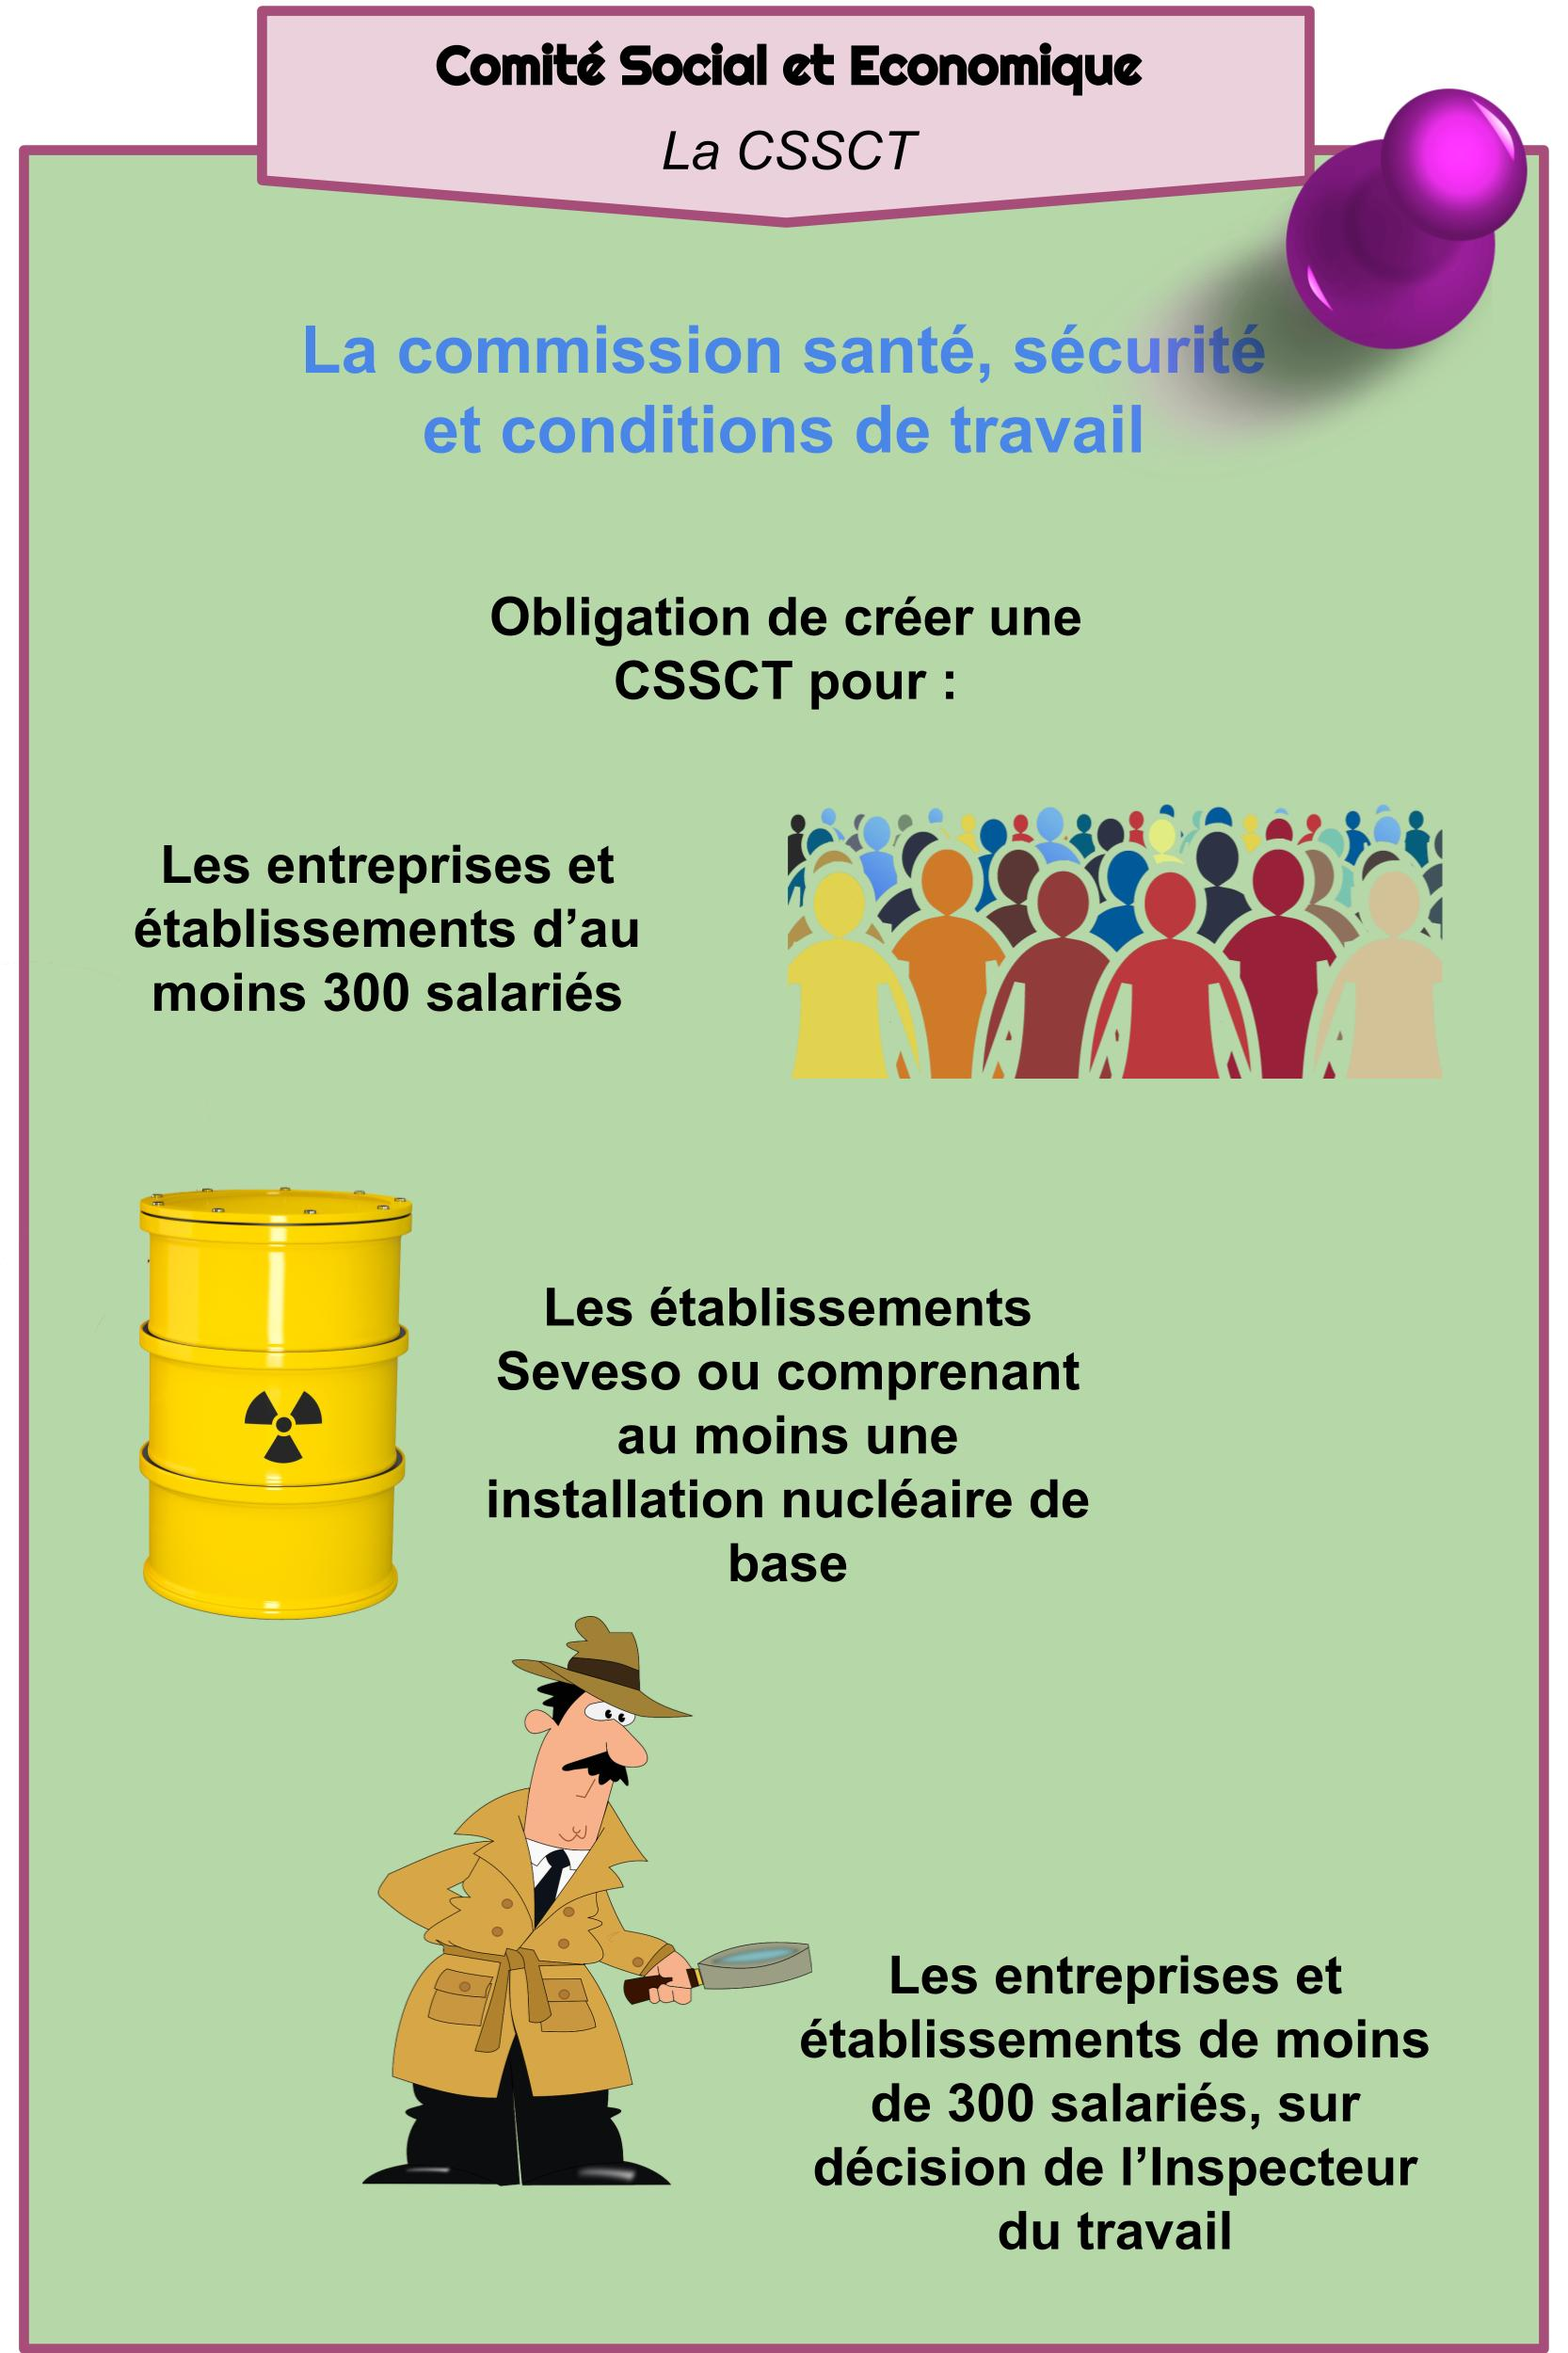 CSE -  La CSSCT